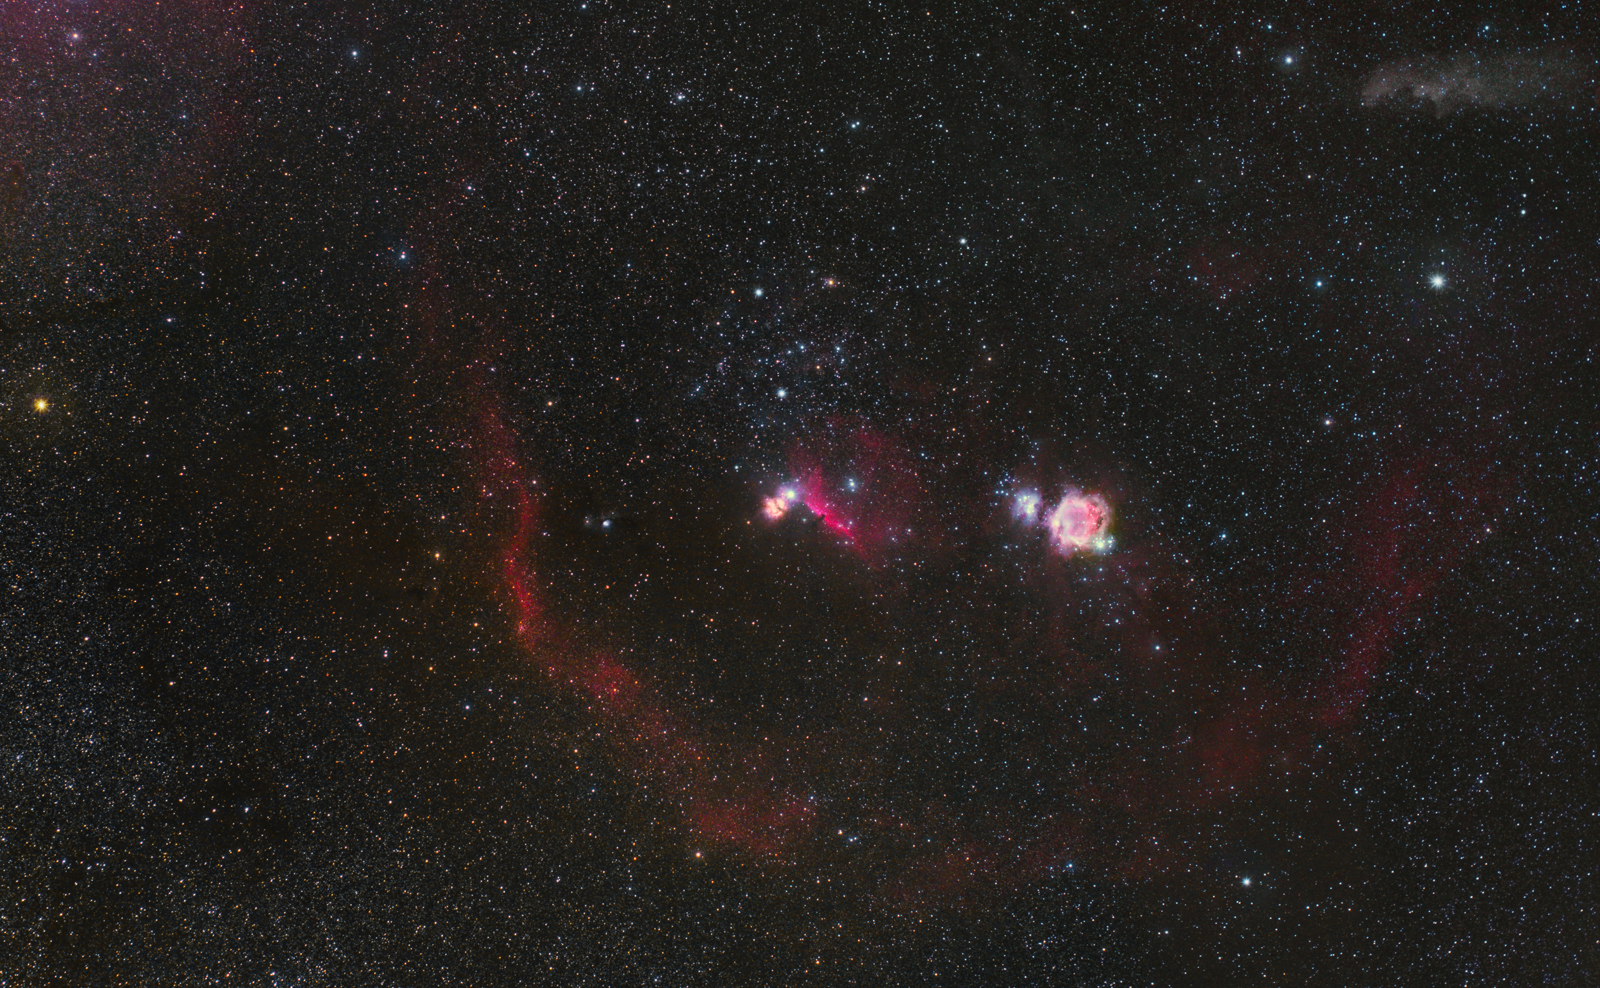 Orion-lpc-cbg3-2.jpg